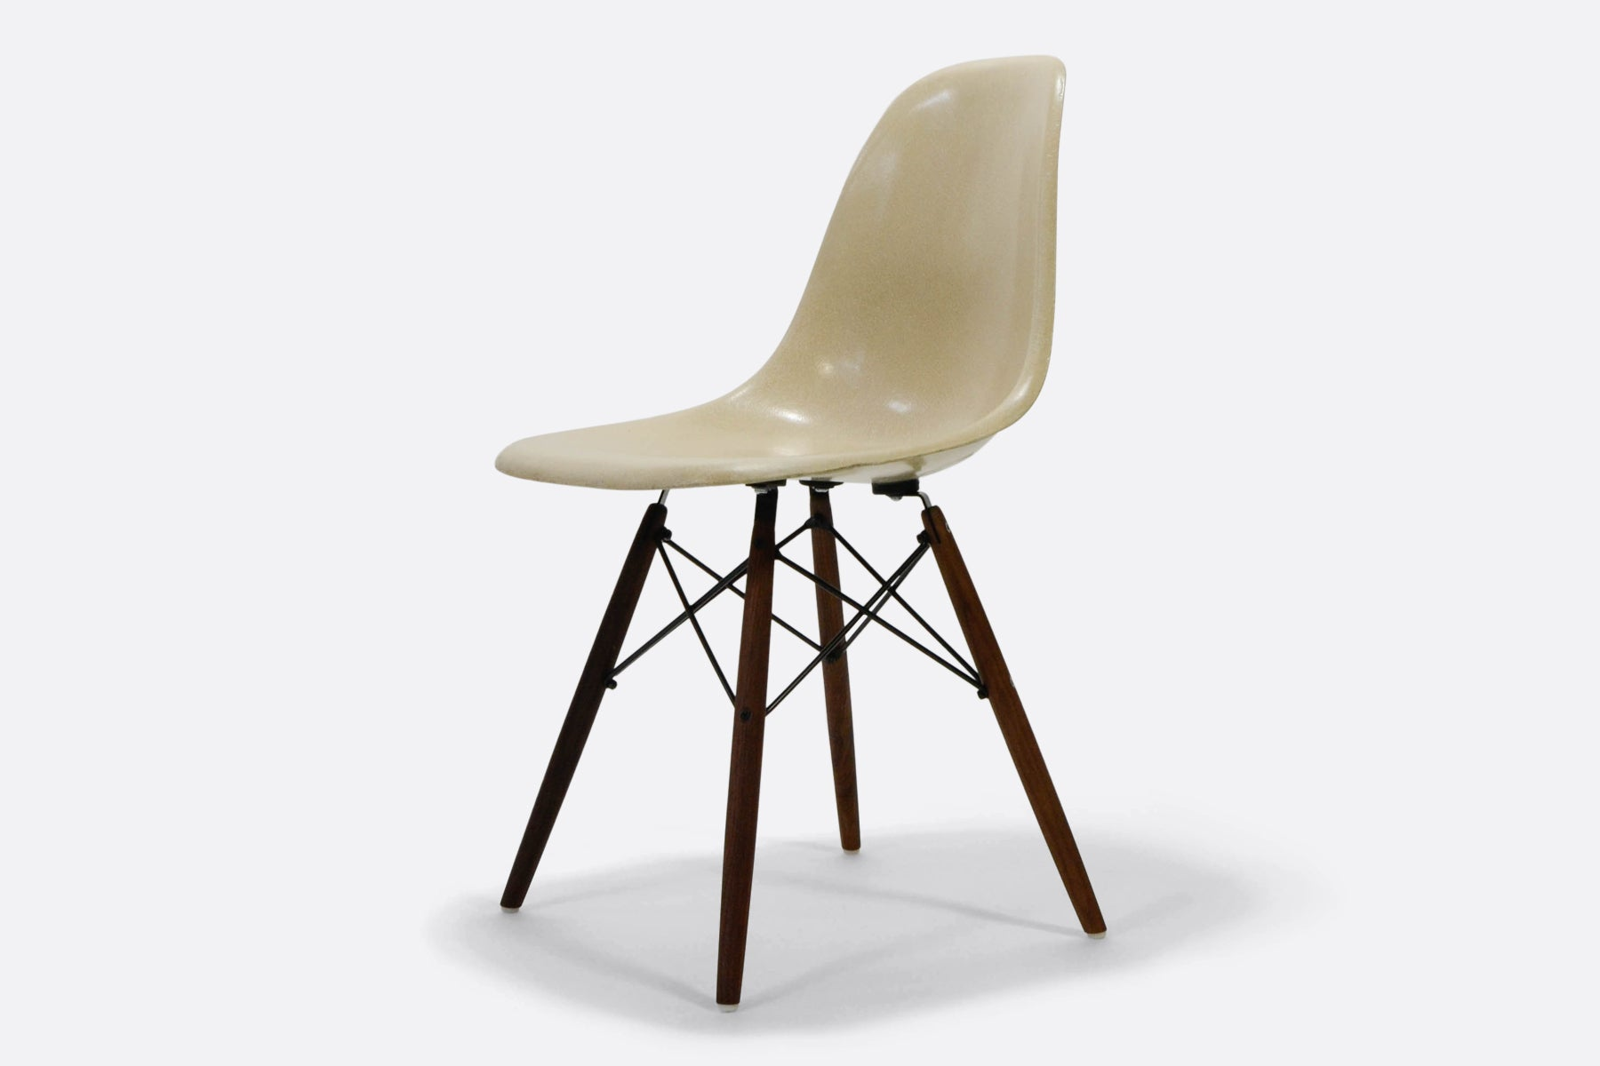 Charles Eames Stoel : Modern vintage amsterdam original eames furniture u home